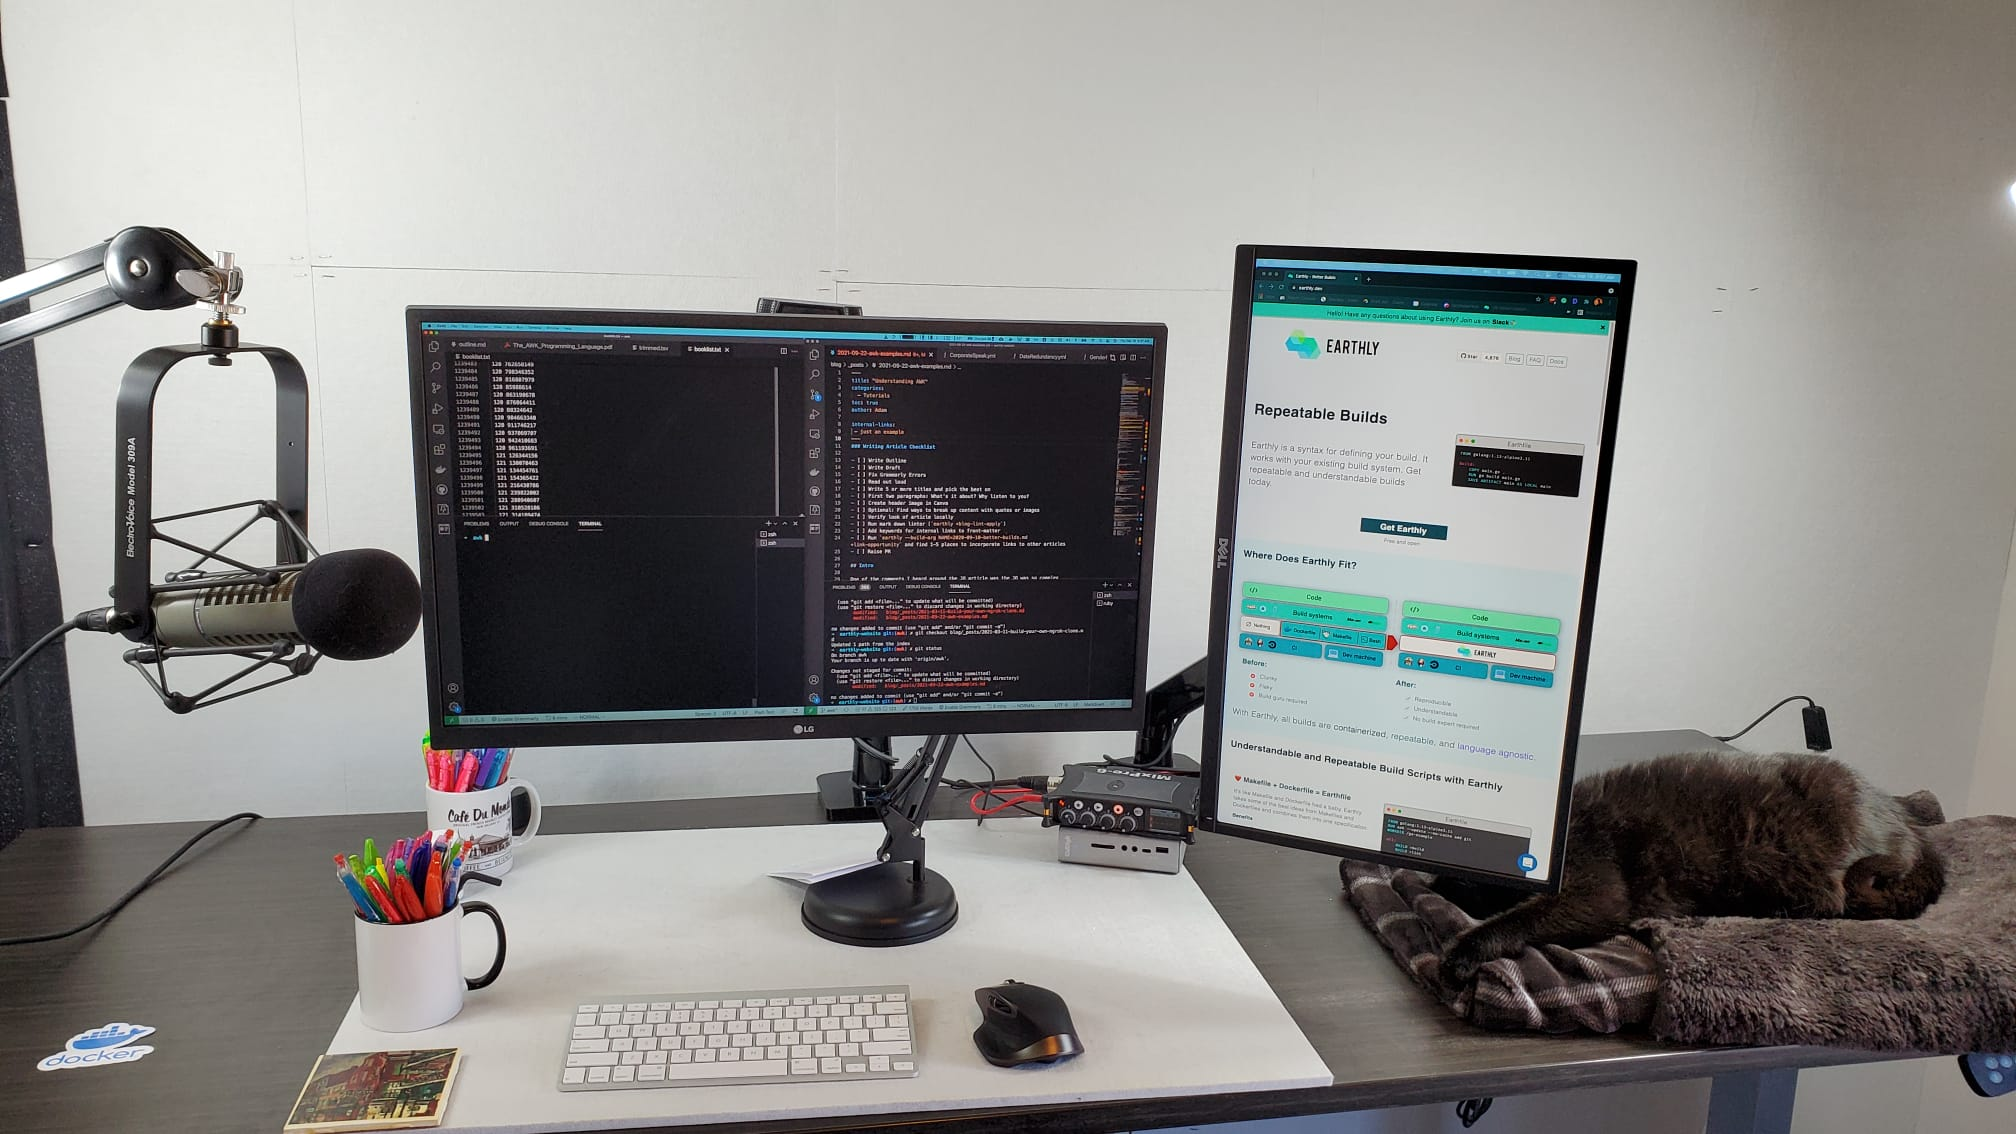 Adam's current desk setup